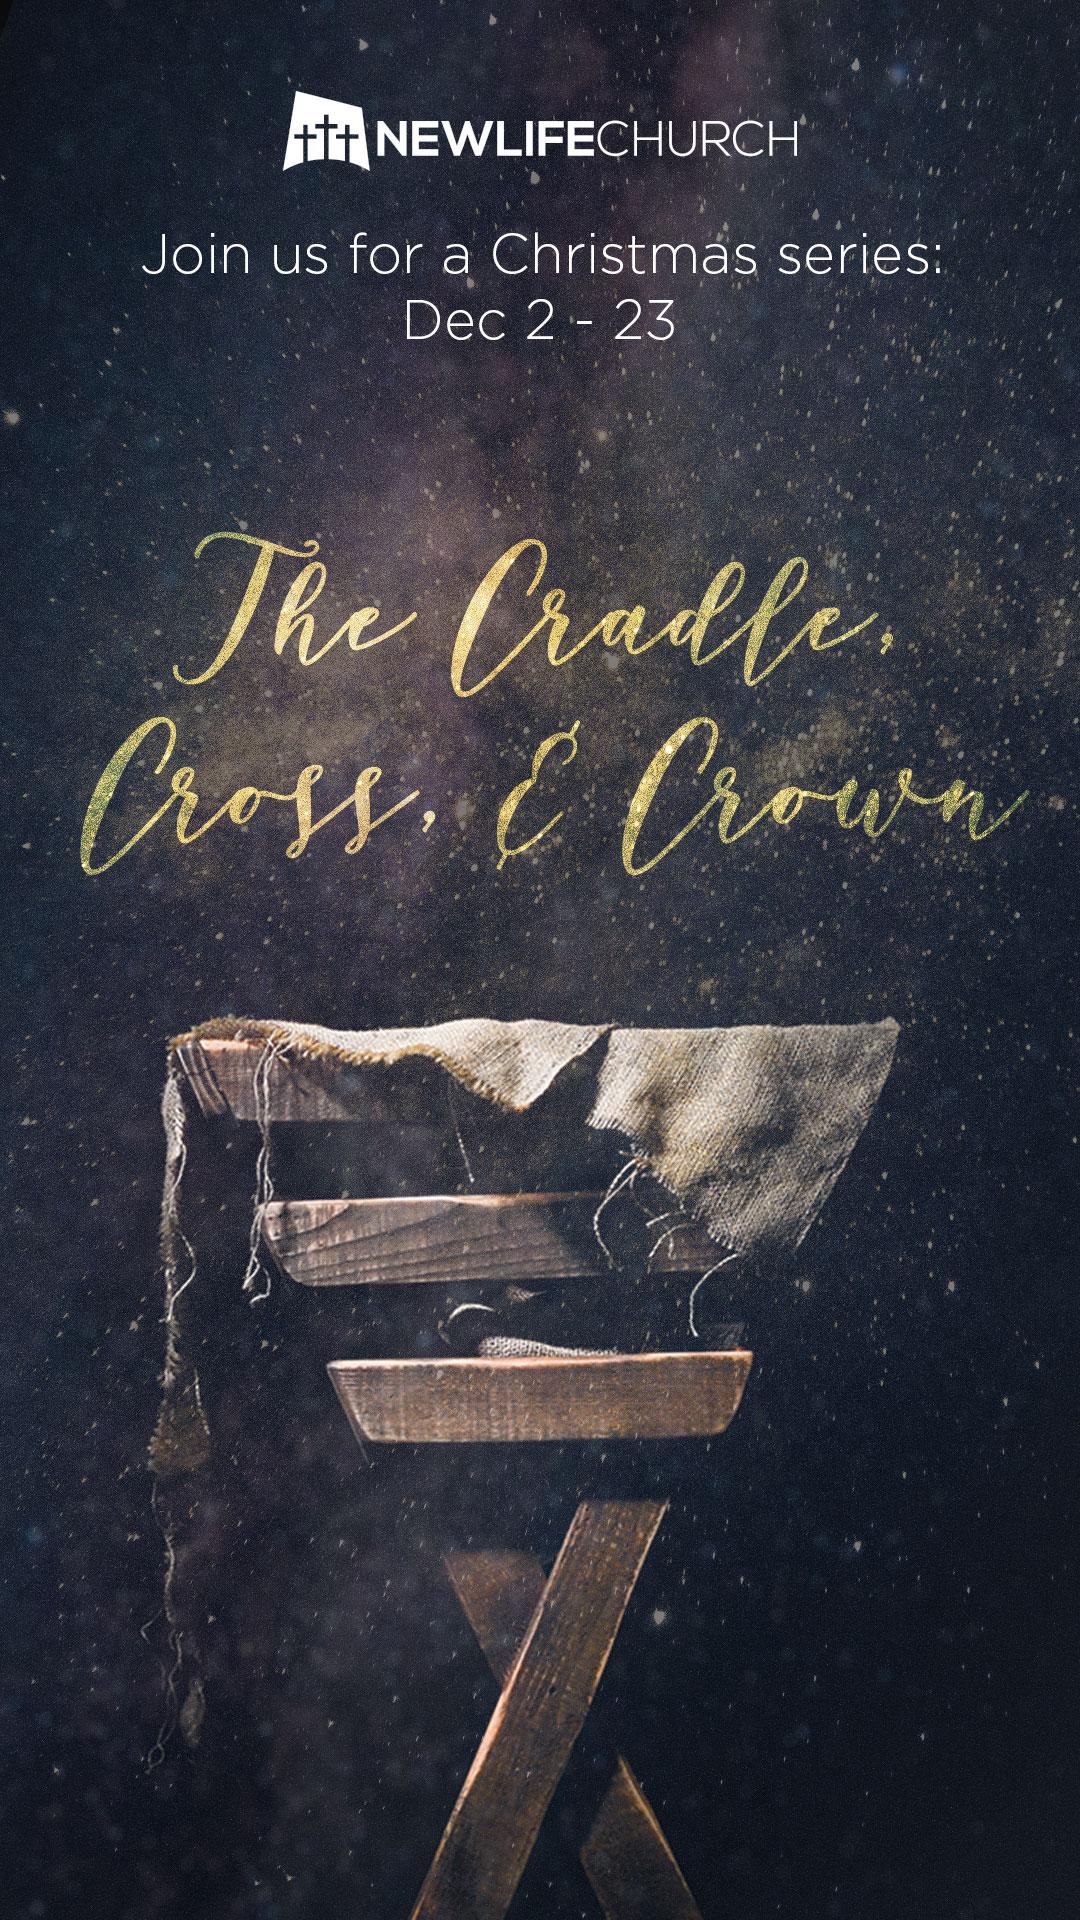 cradlecrosscrown_insta-story